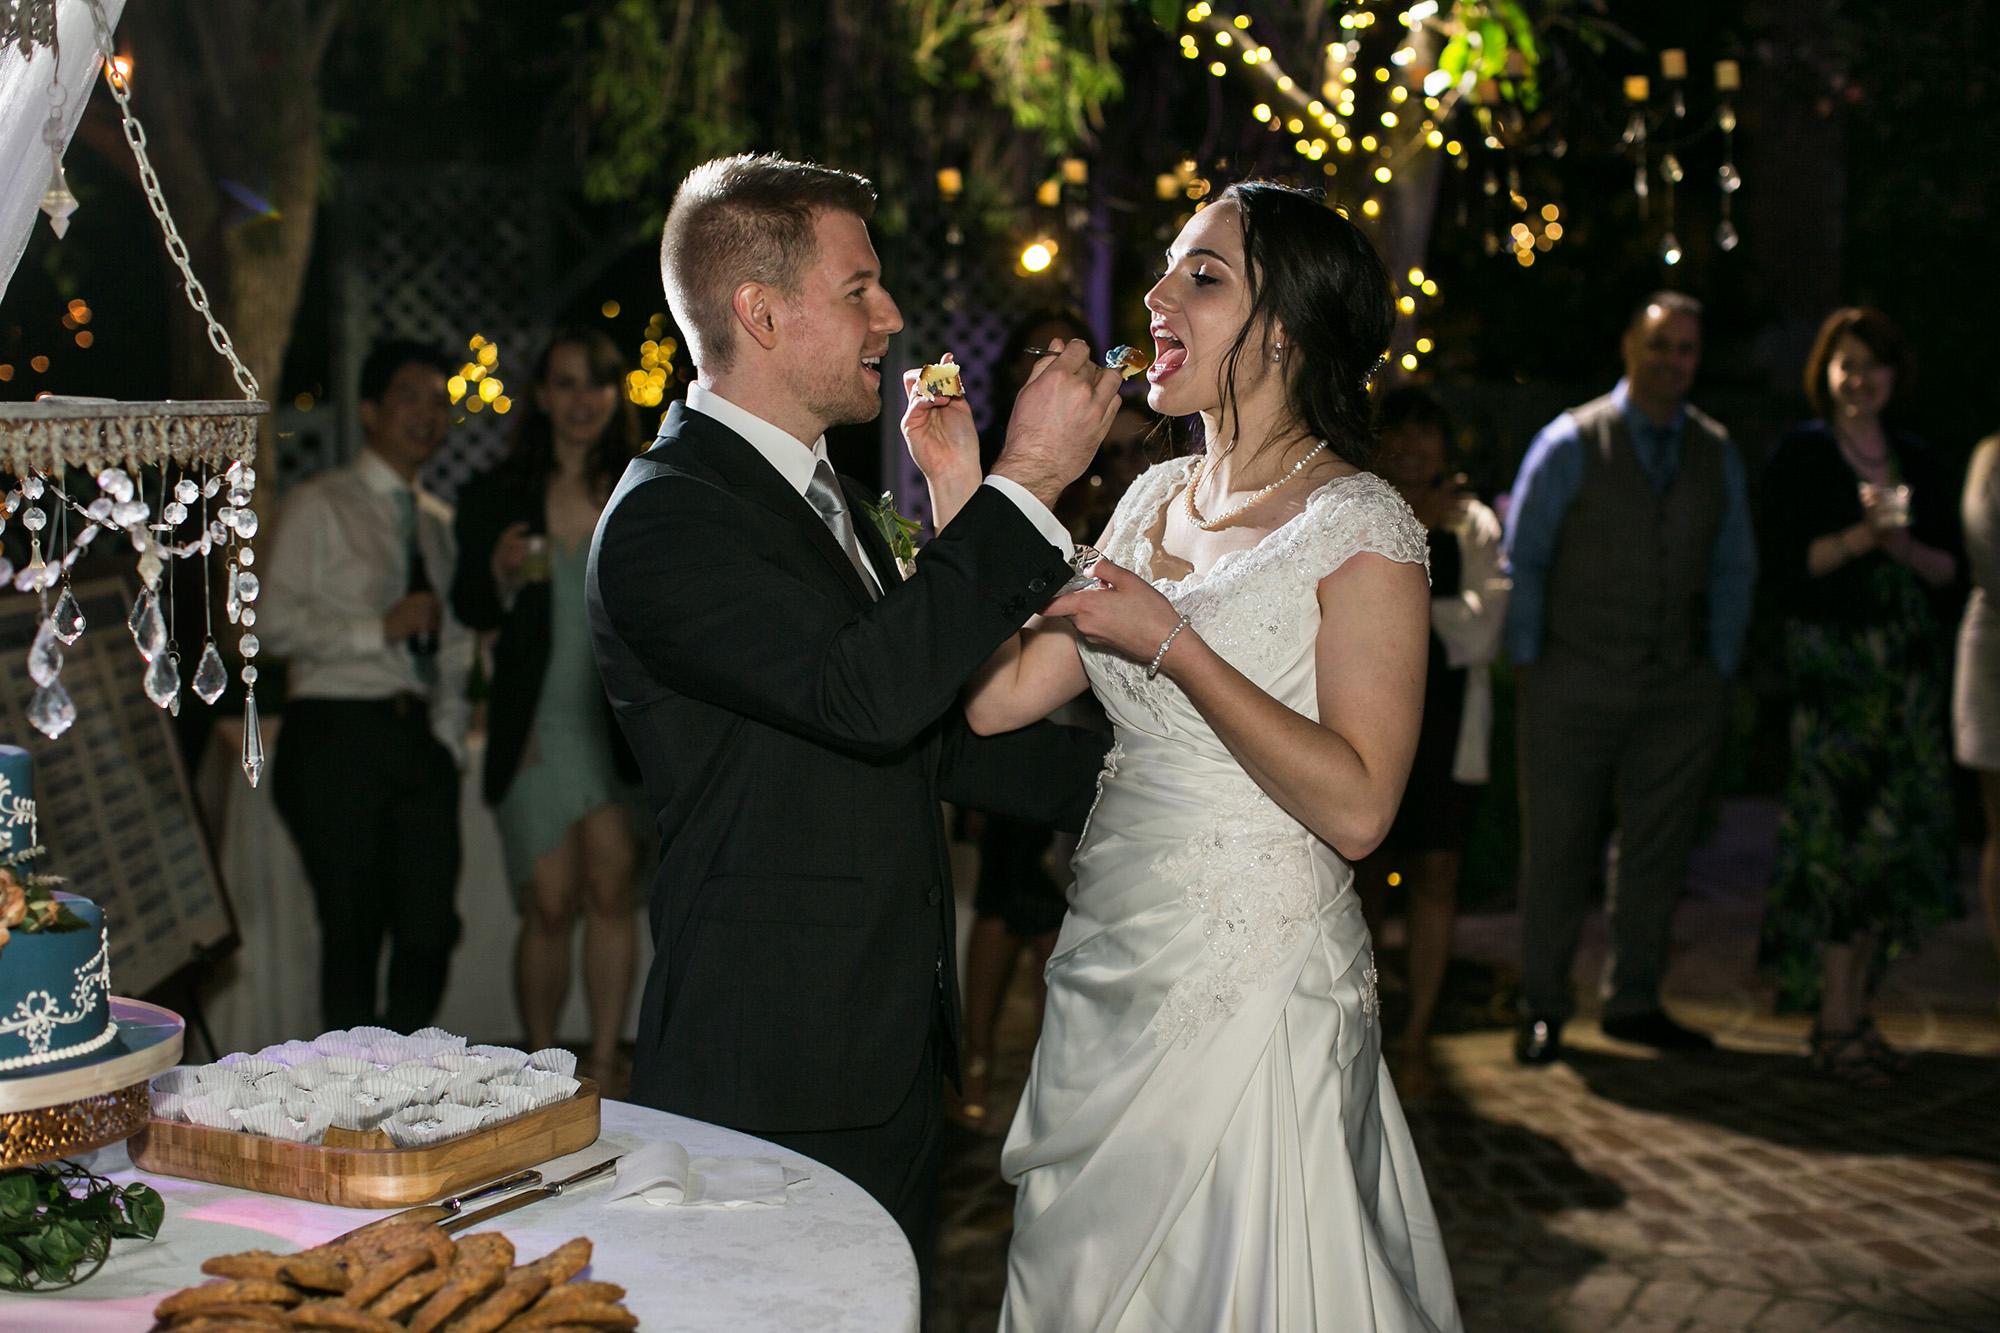 associate-photographer-christmas-house-wedding-carrie-vines-0117.jpg